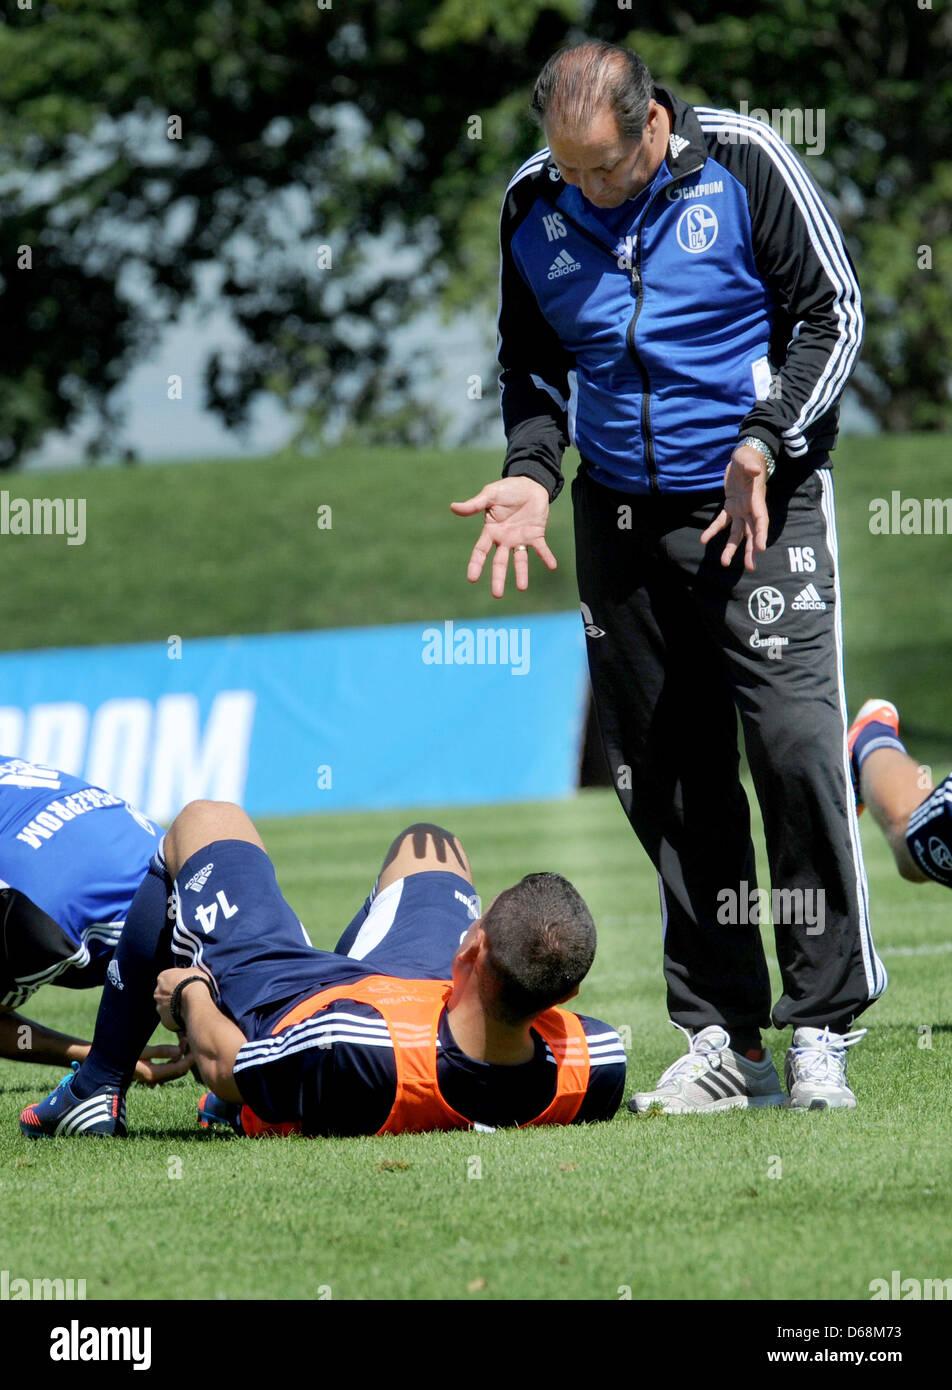 Schalke's head coach Huub Stevens takes part in practice at the training camp of FCSchalke 04 in Donaueschingen, - Stock Image